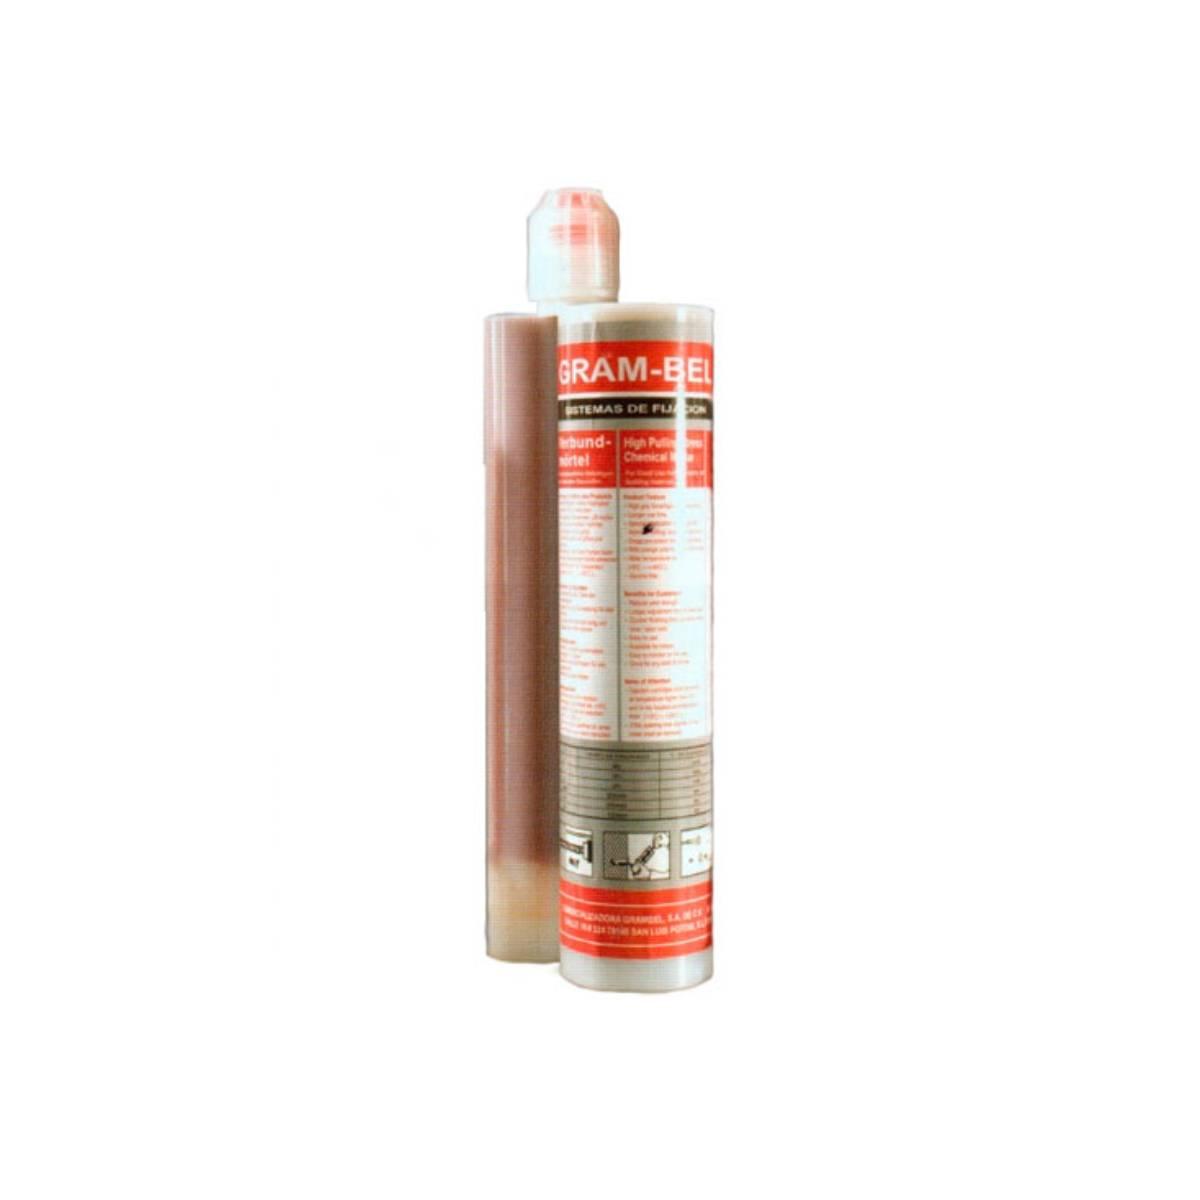 Cartucho De Resina Epoxica 400 Ml De Concreto EPOX1 Gram-Bel